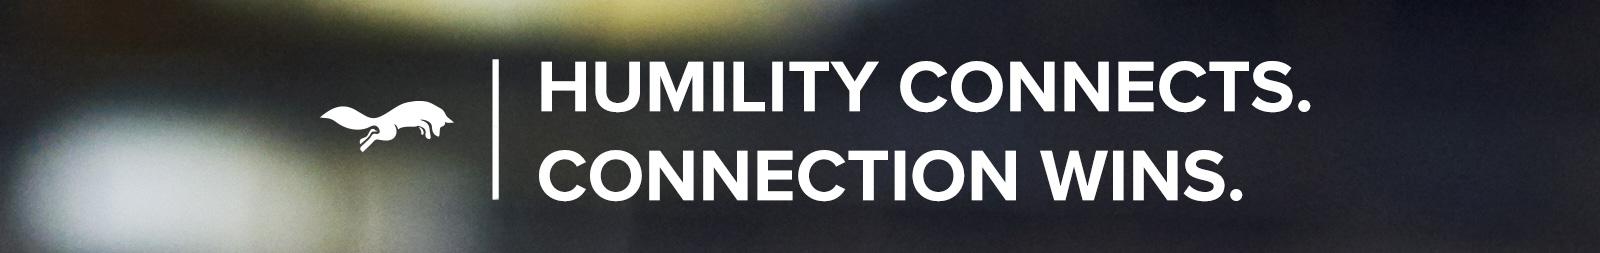 Golden-Humility.jpg